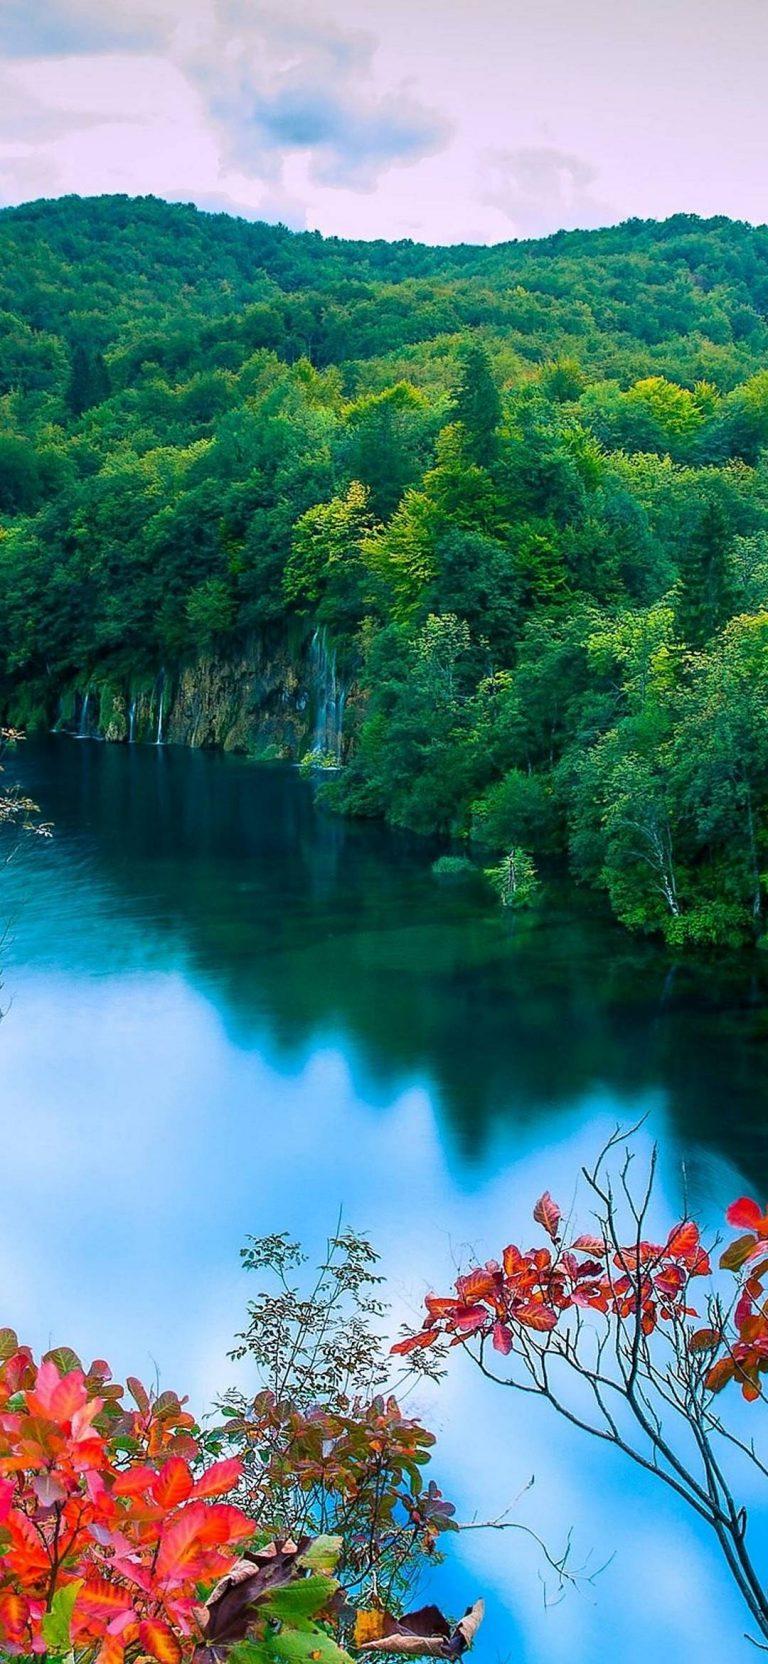 Autumn-Forest-Lake-Trees-Waterfalls-1080x2340-768x1664 - 50+ Free Xiaomi Mi CC9 Phone Wallpapers [year]